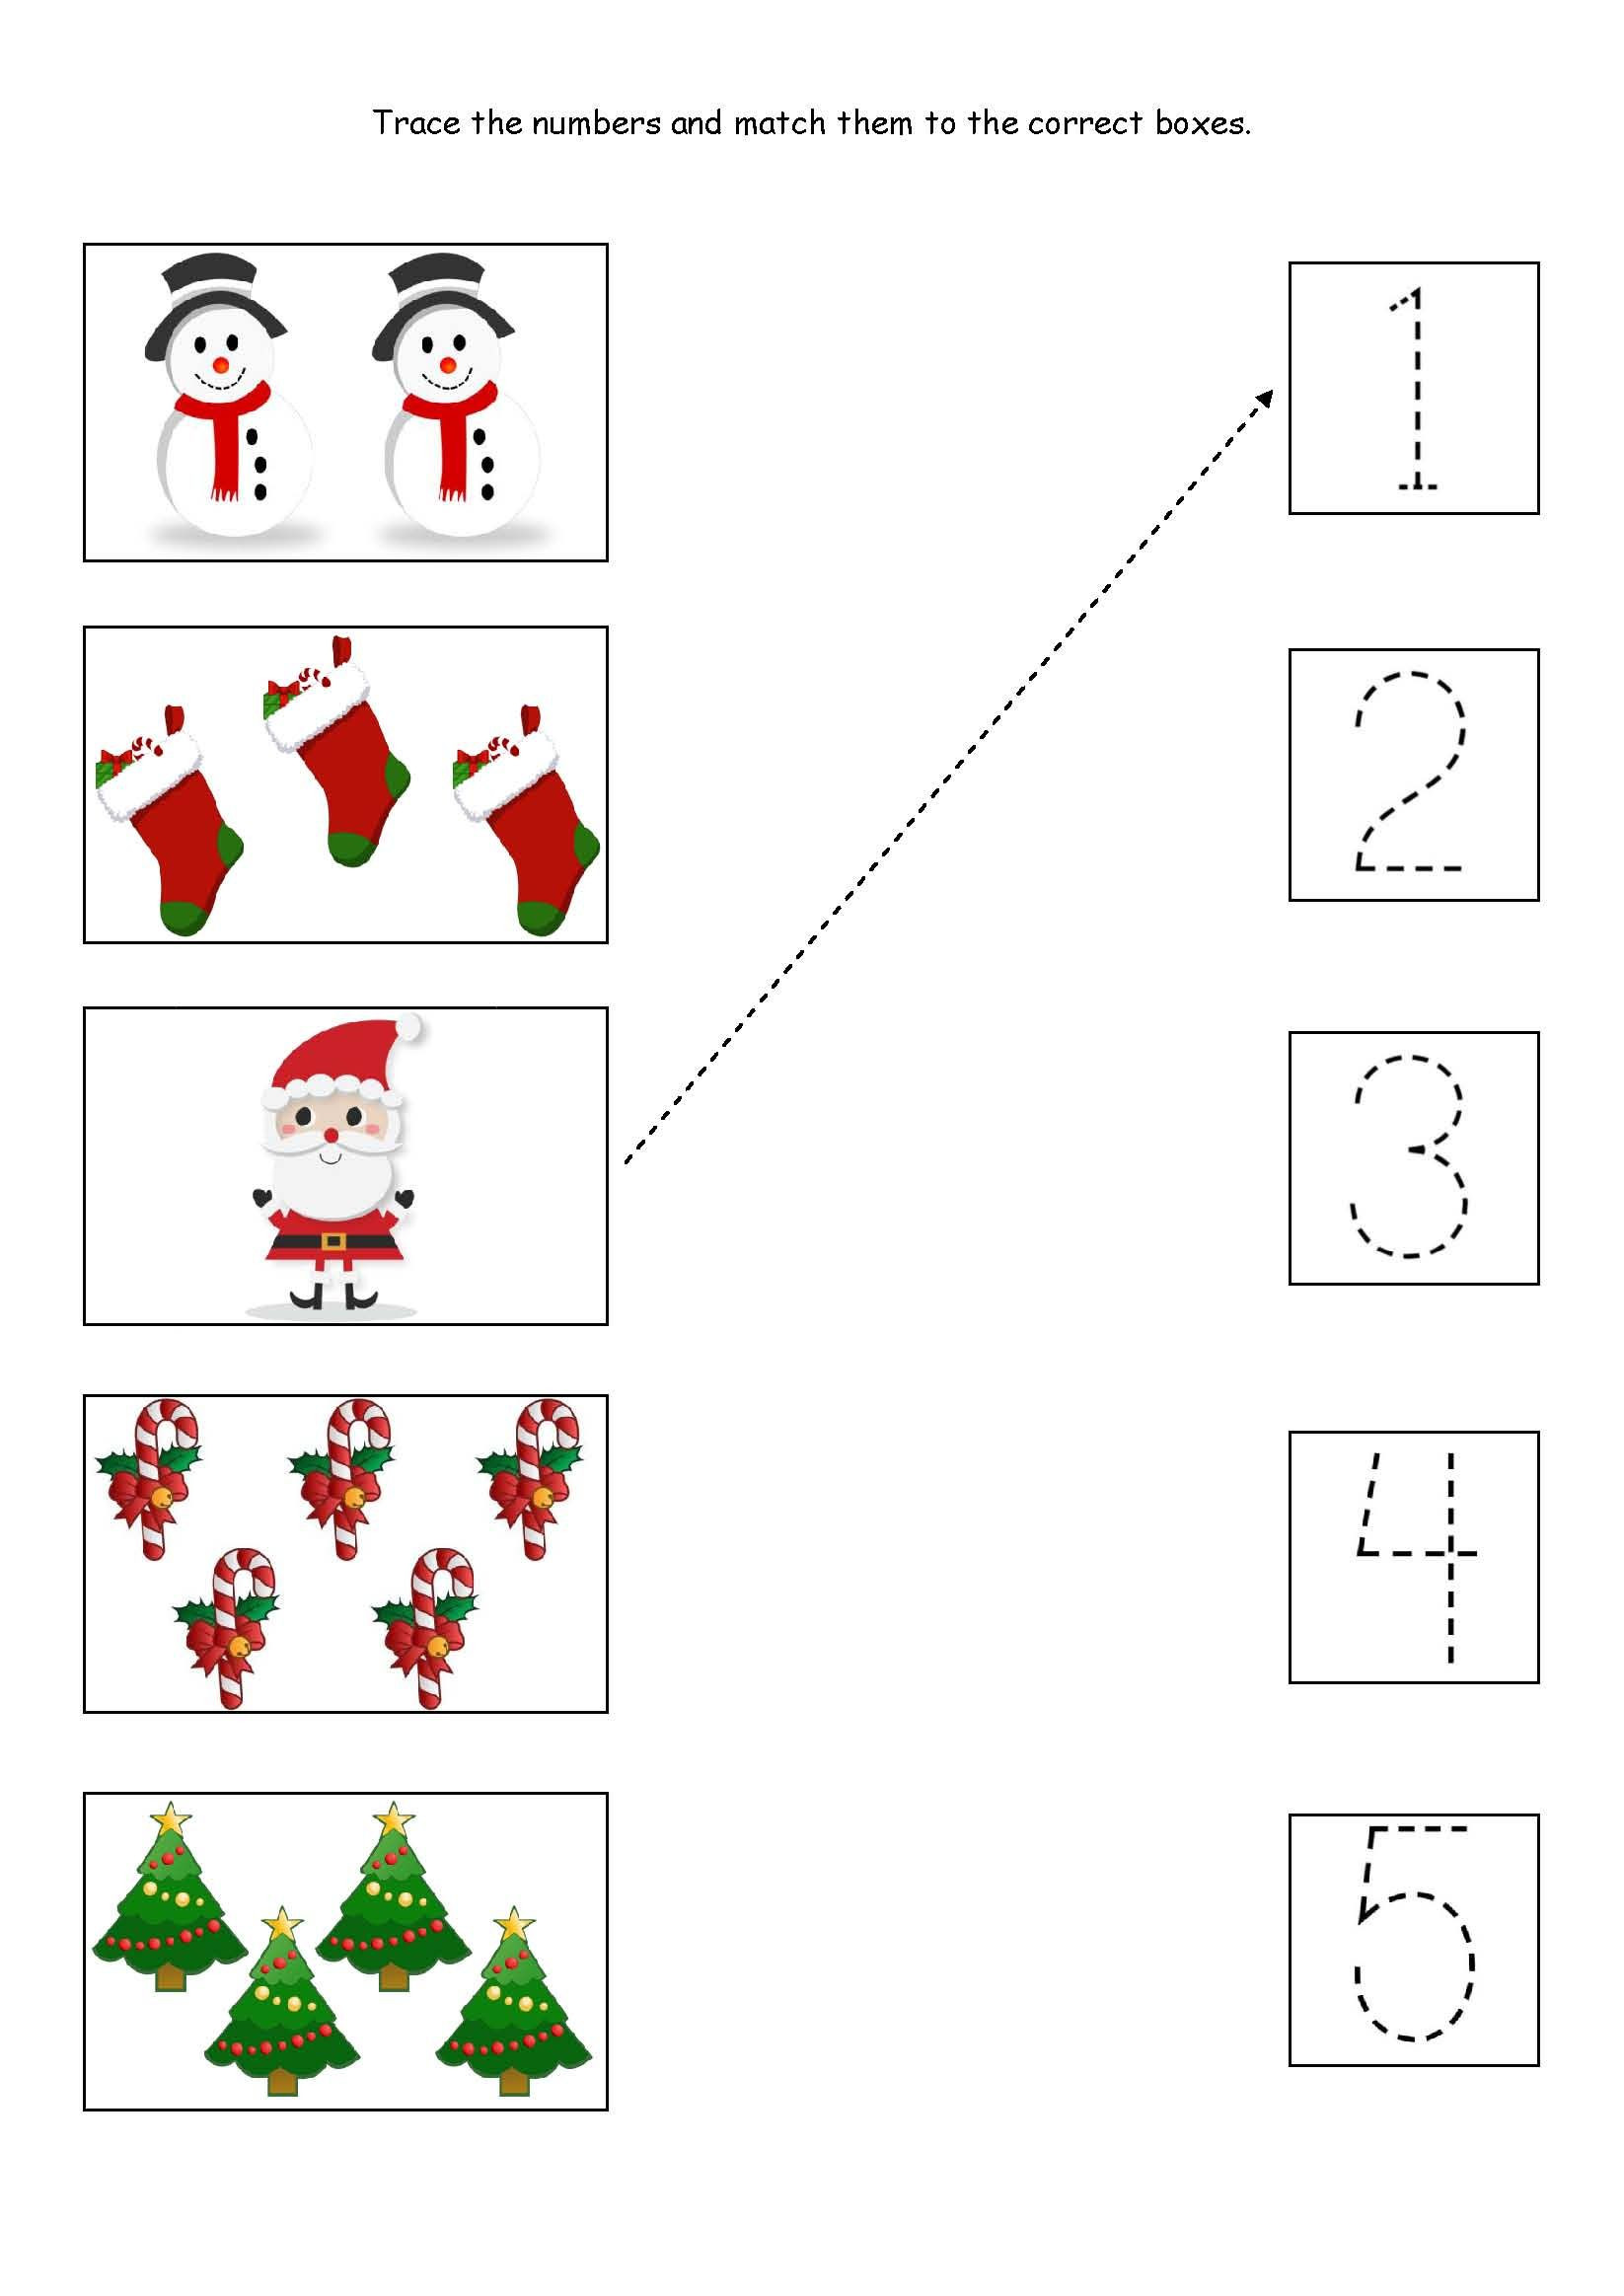 Christmas Counting Worksheets Kindergarten Cute Little Christmas Counting Matching and Tracing